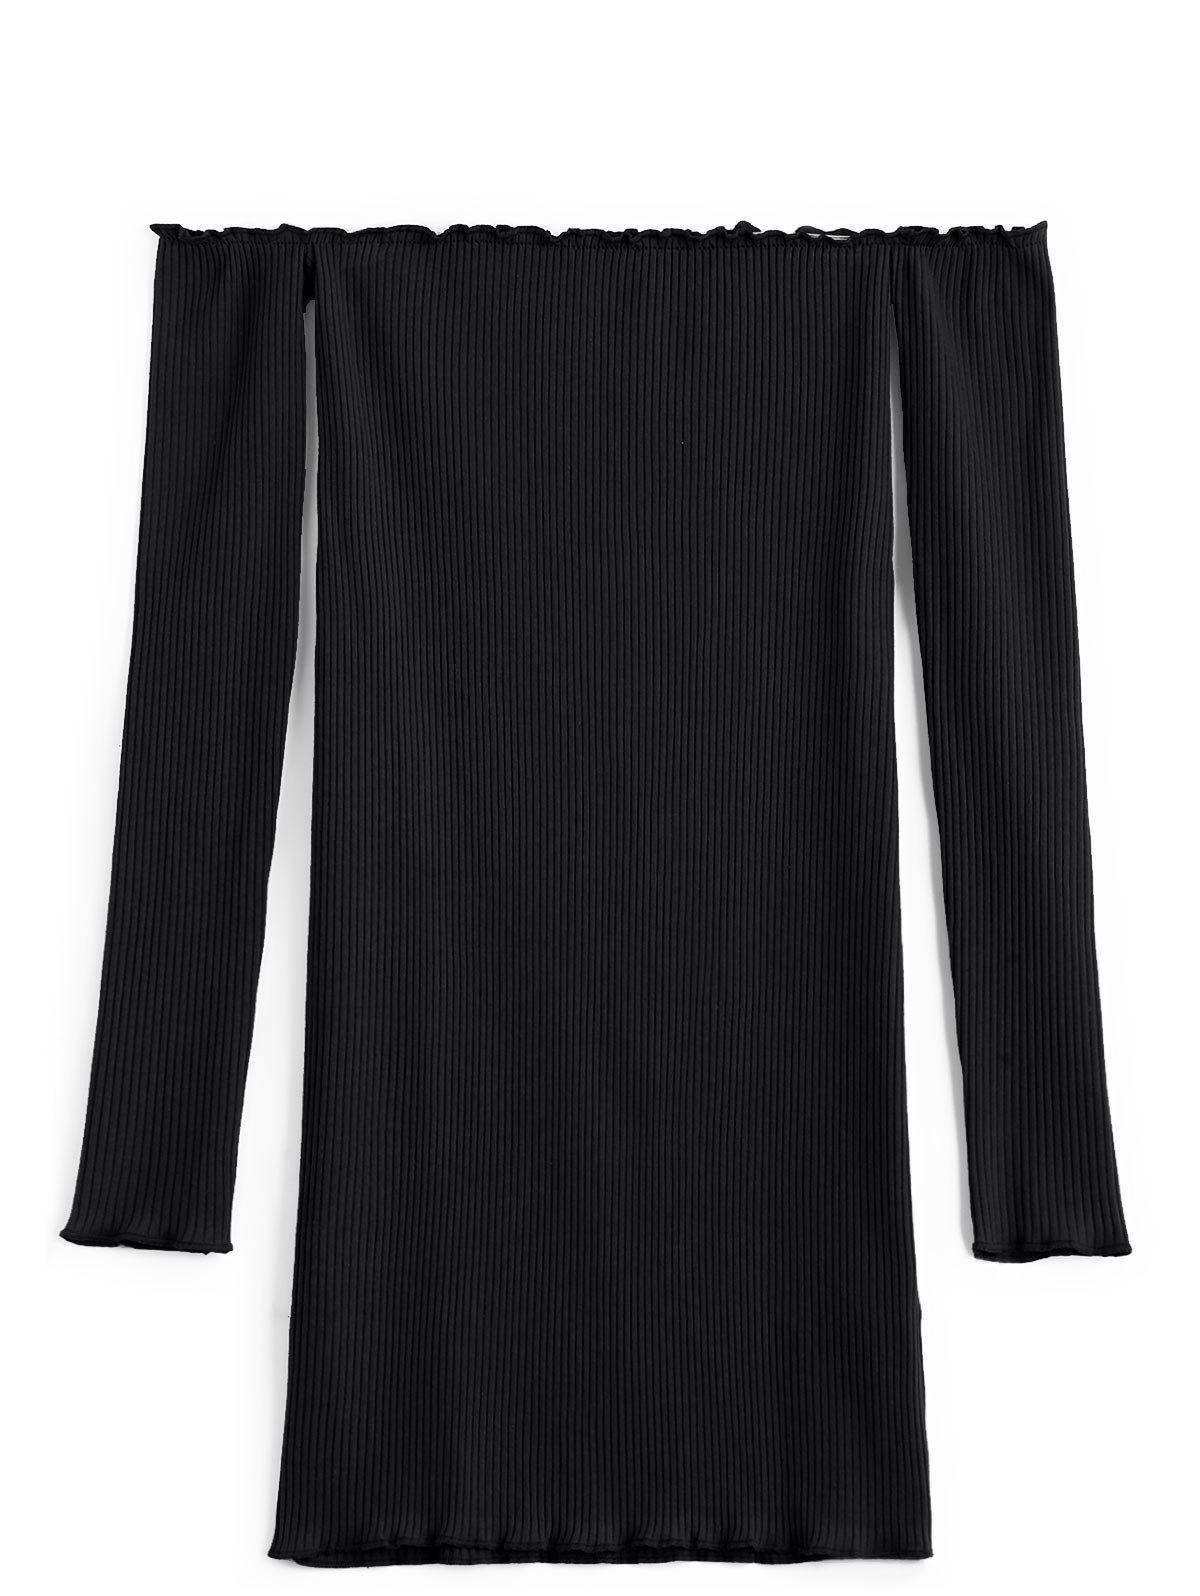 Long Knitted Ruffled Ribbed Top 230489106